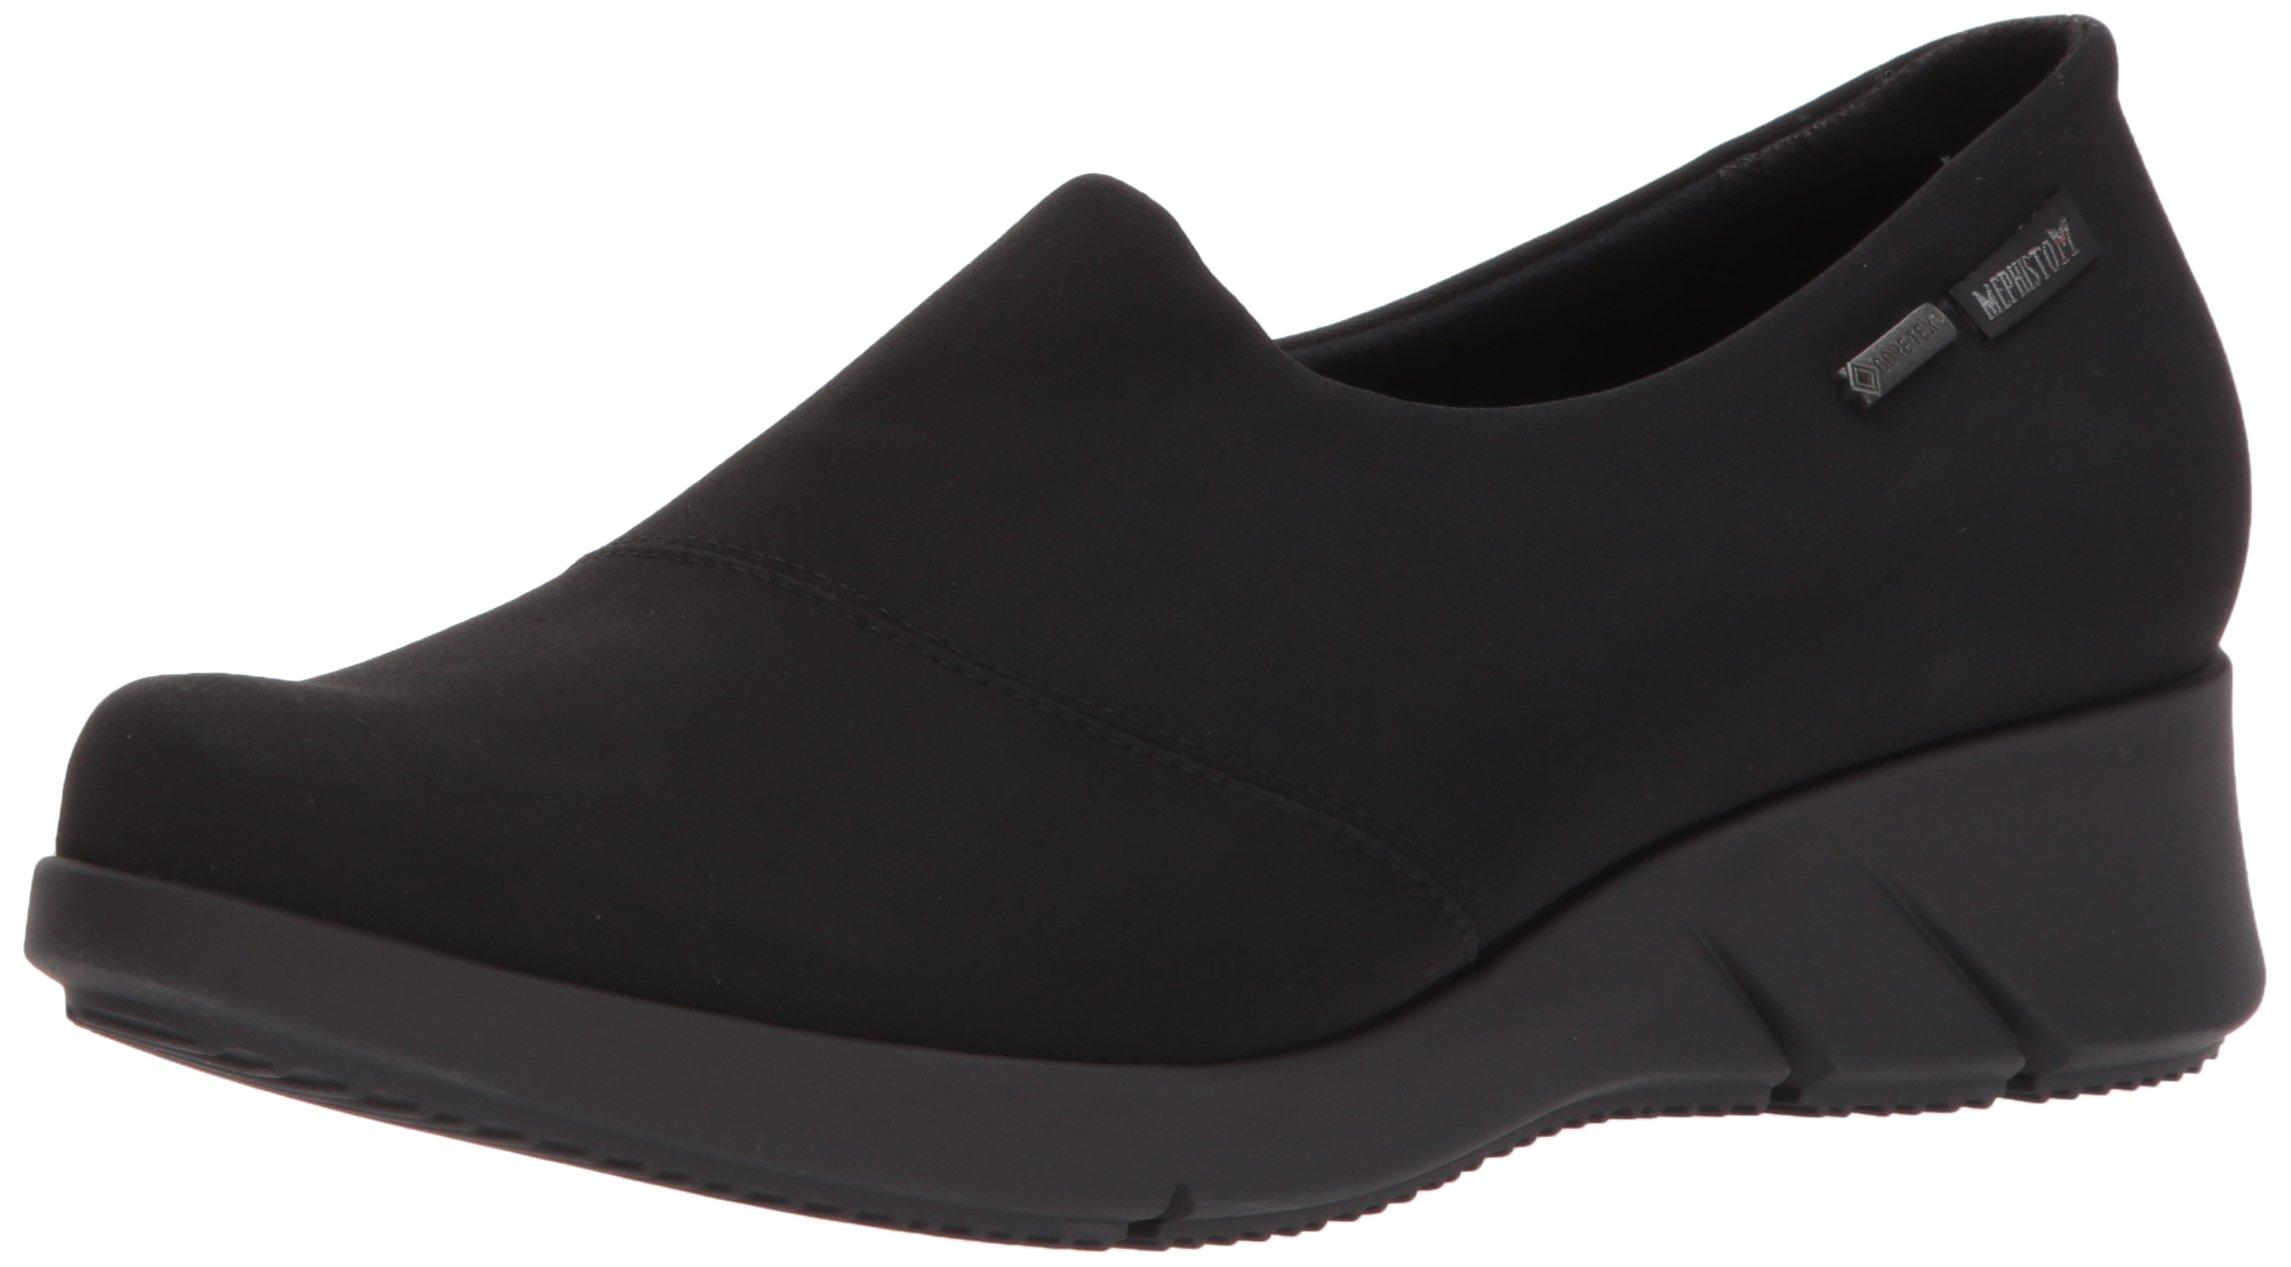 Mephisto Women's Molly Gt Rain Shoe, Black Stretch, 6 M US